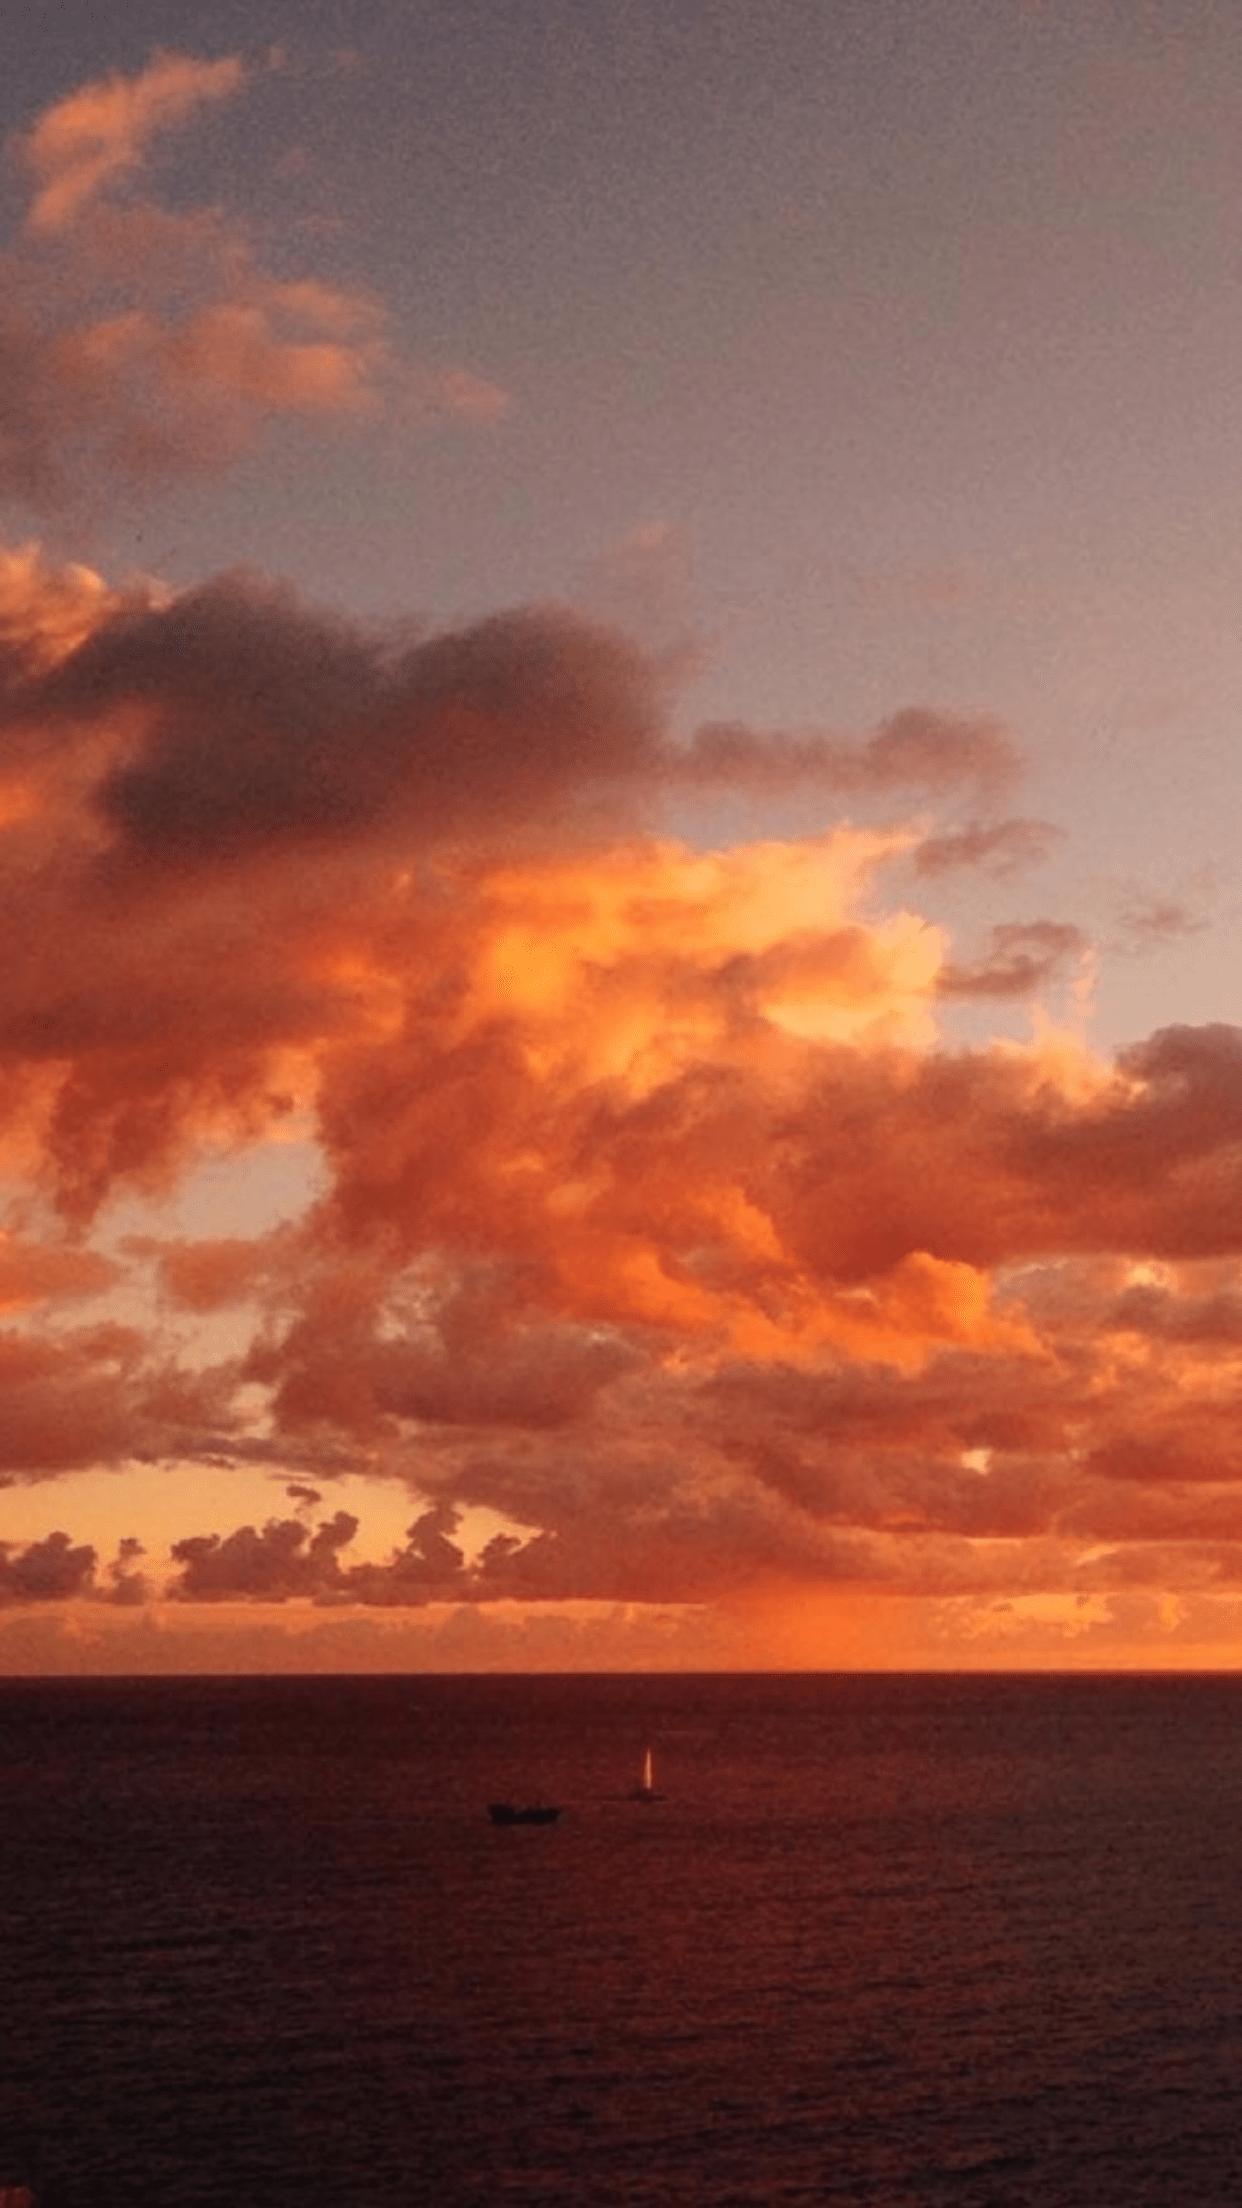 Orange Sunset Aesthetic Wallpapers - Top Free Orange ...